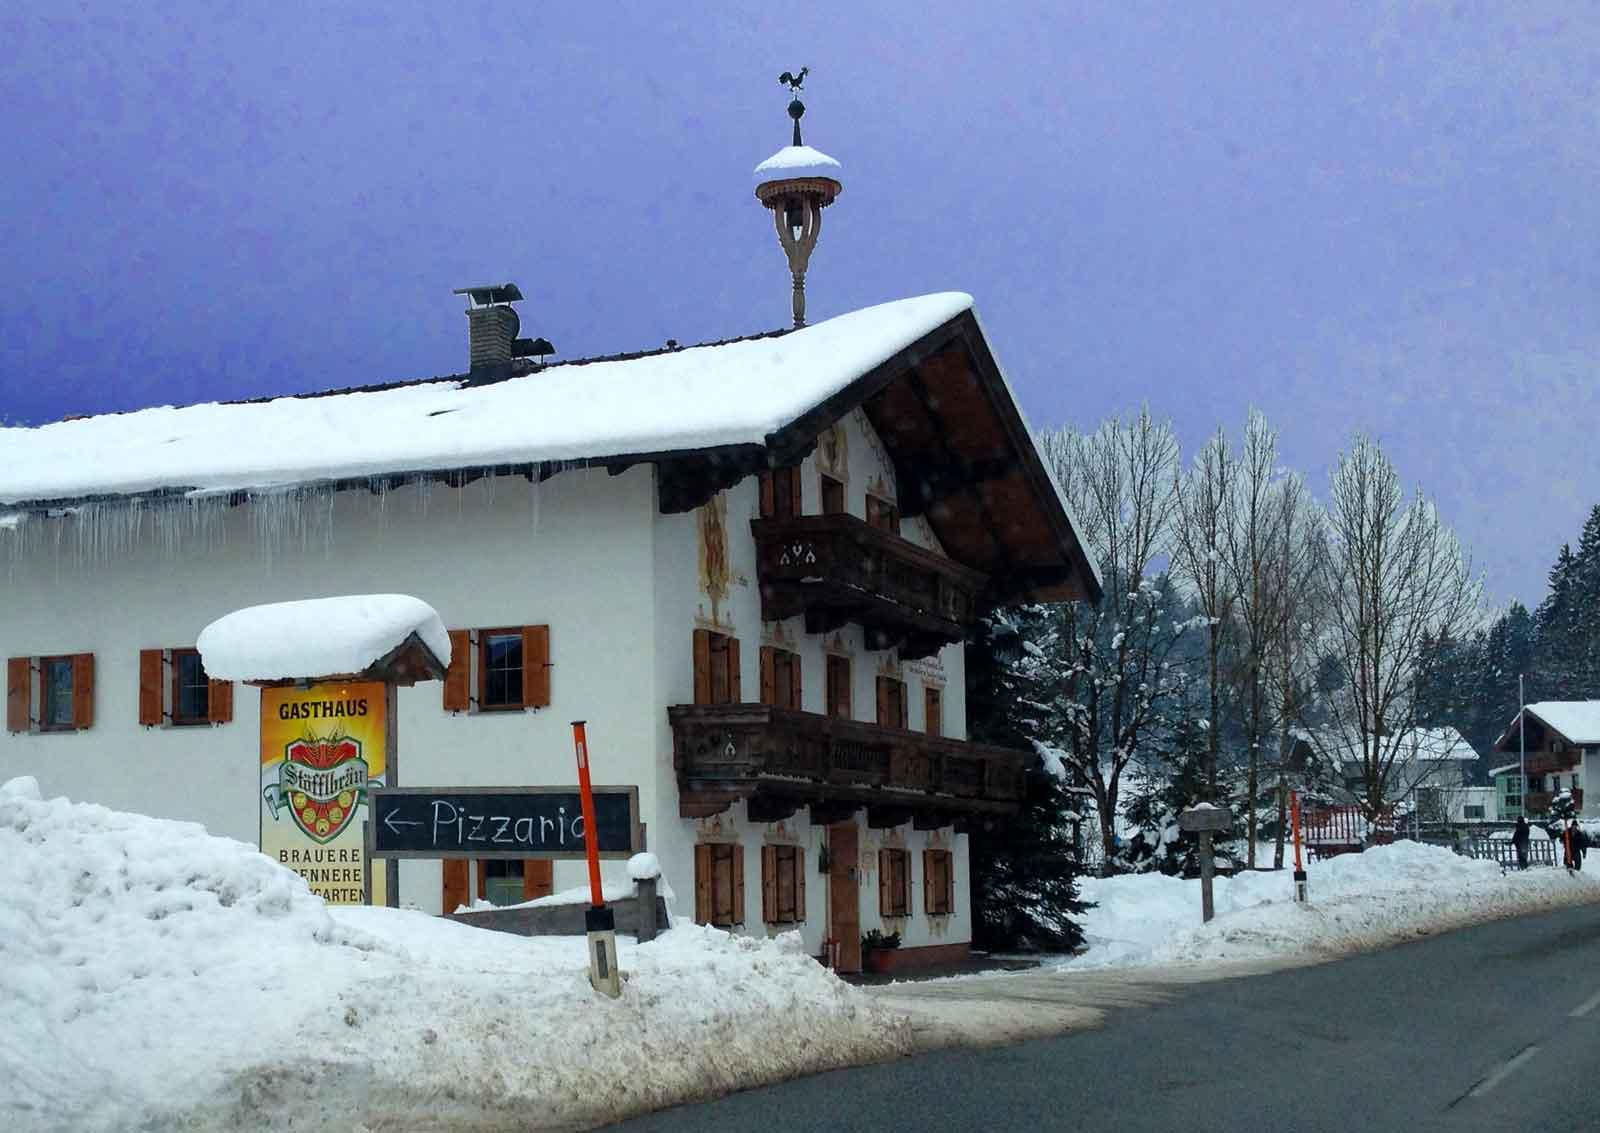 Bierol-Braugasthof